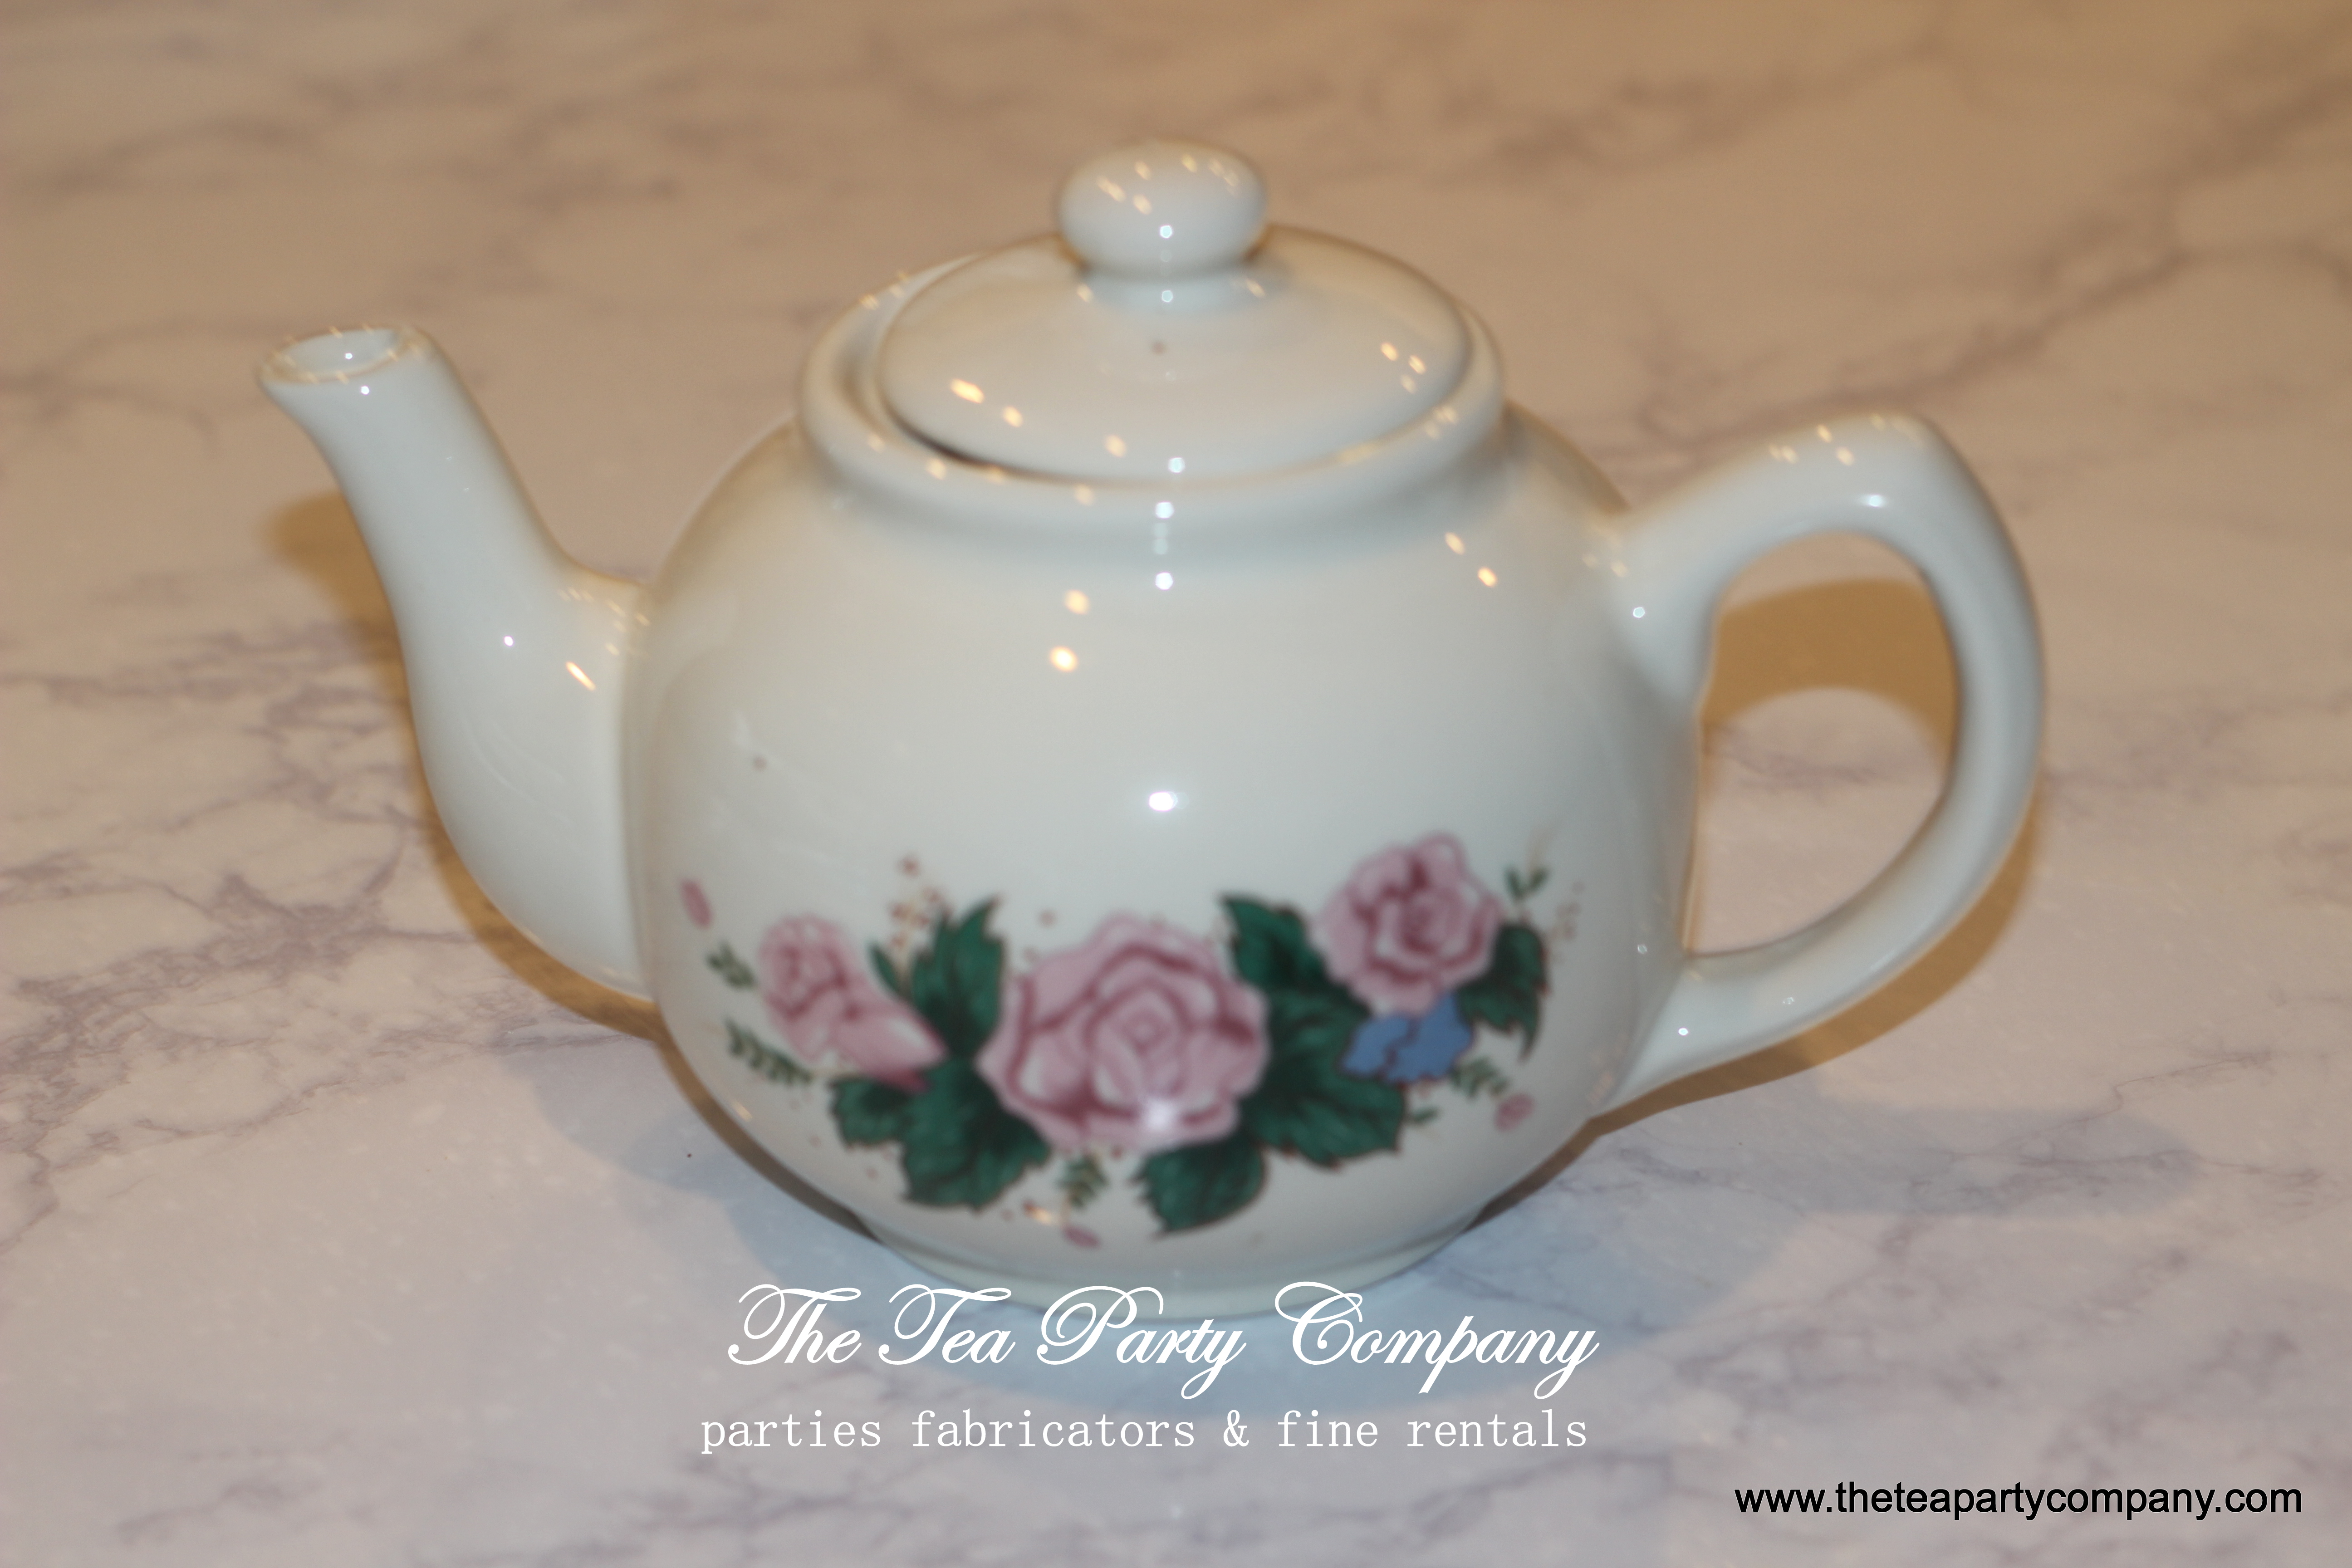 Mismatch Tea Pots The Tea Party Company (9)